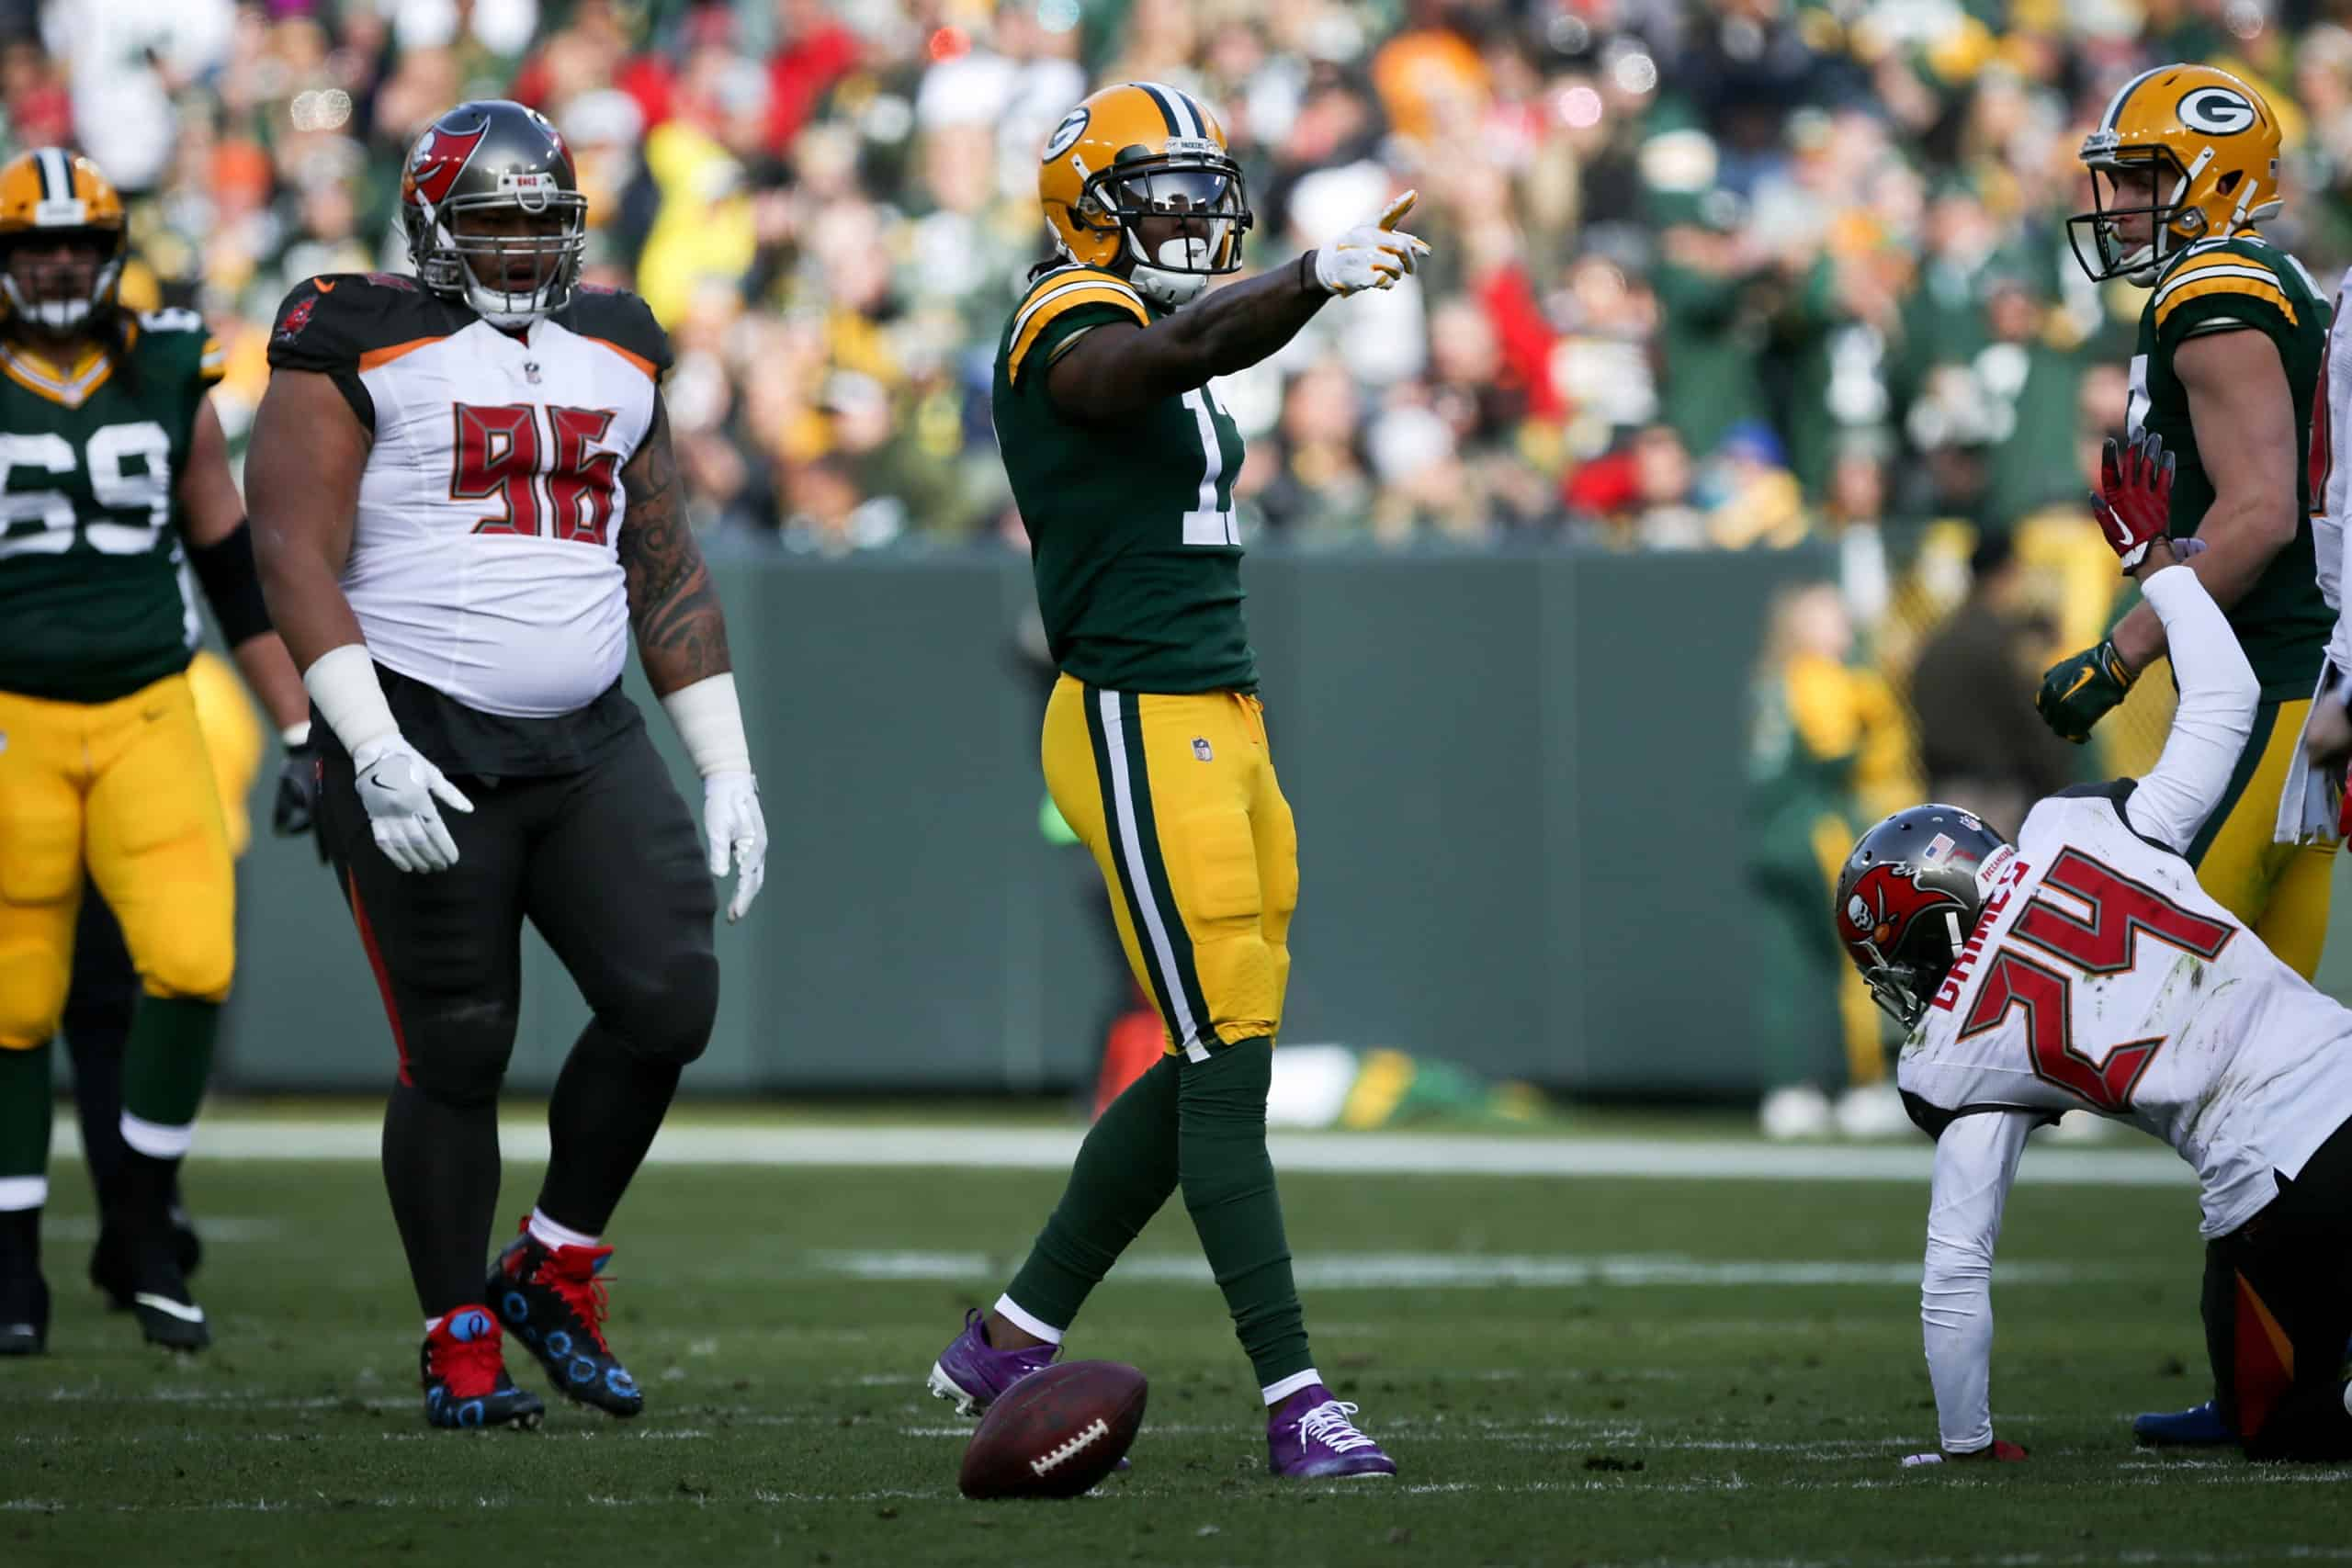 Green Bay Packers Offense vs. Tampa Bay Buccaneers Defense